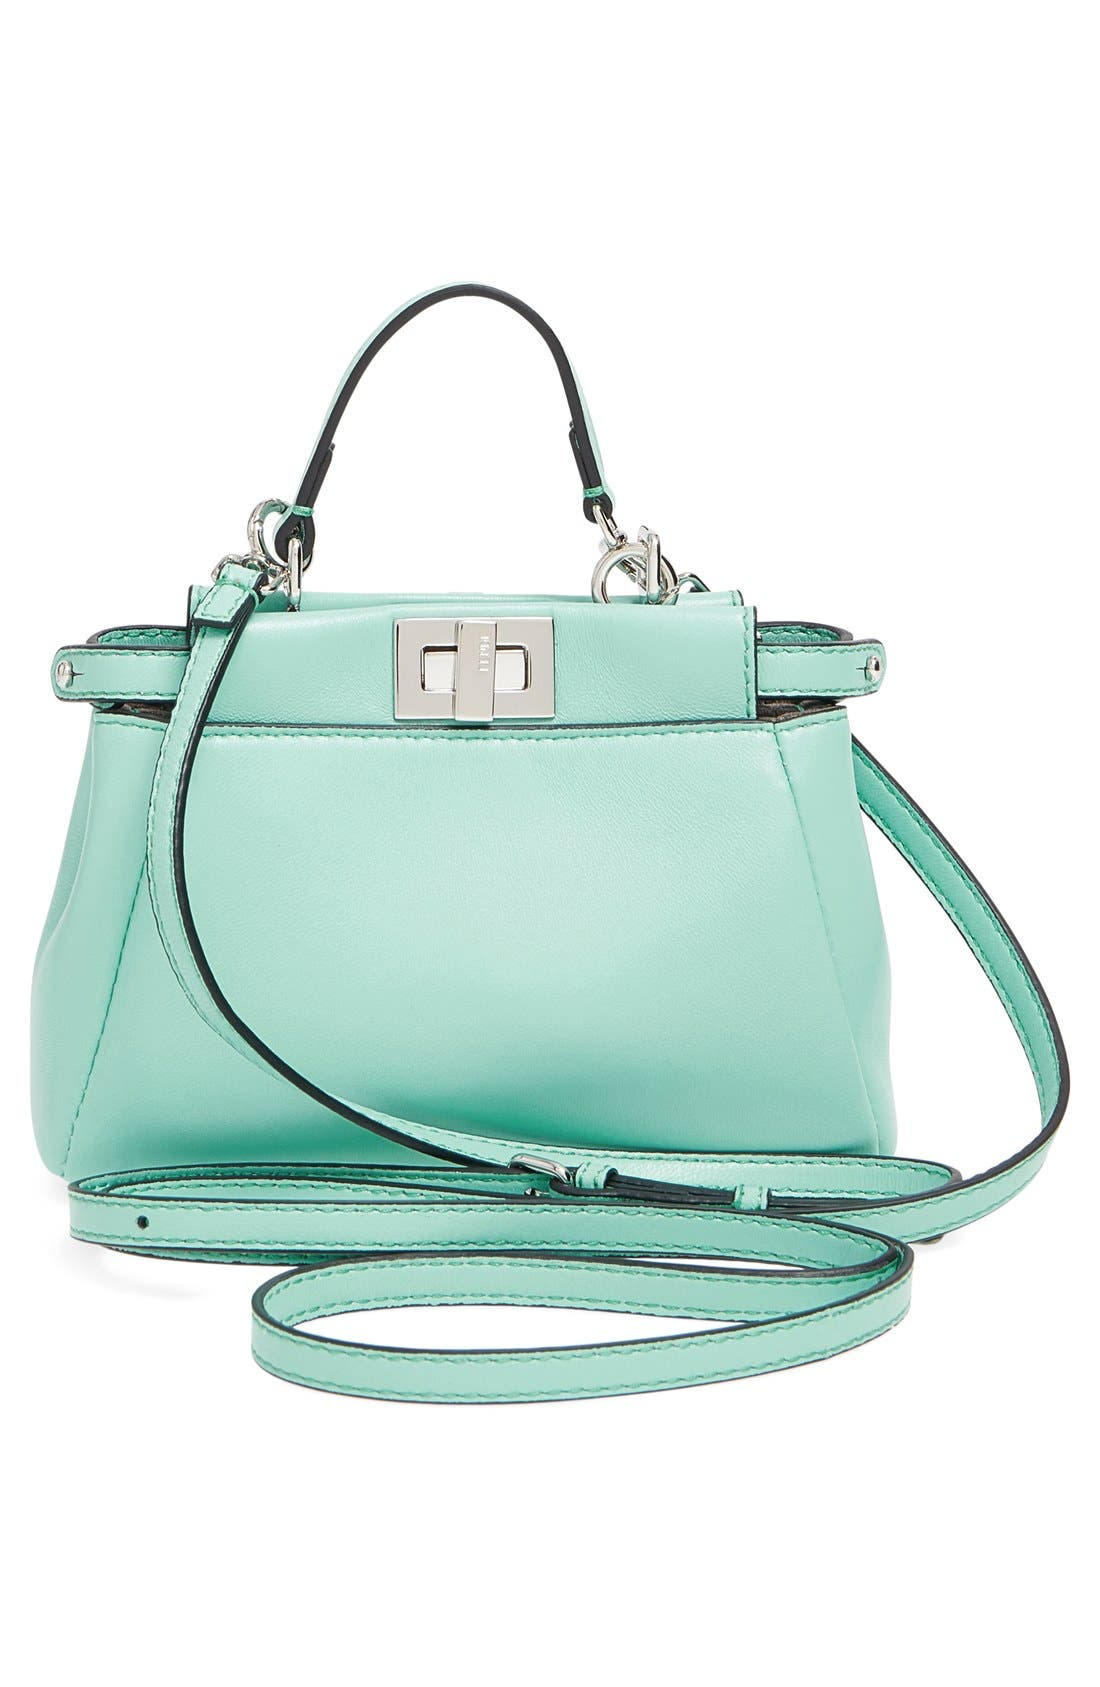 Alternate Image 3  - Fendi 'Micro Peekaboo' Nappa Leather Bag